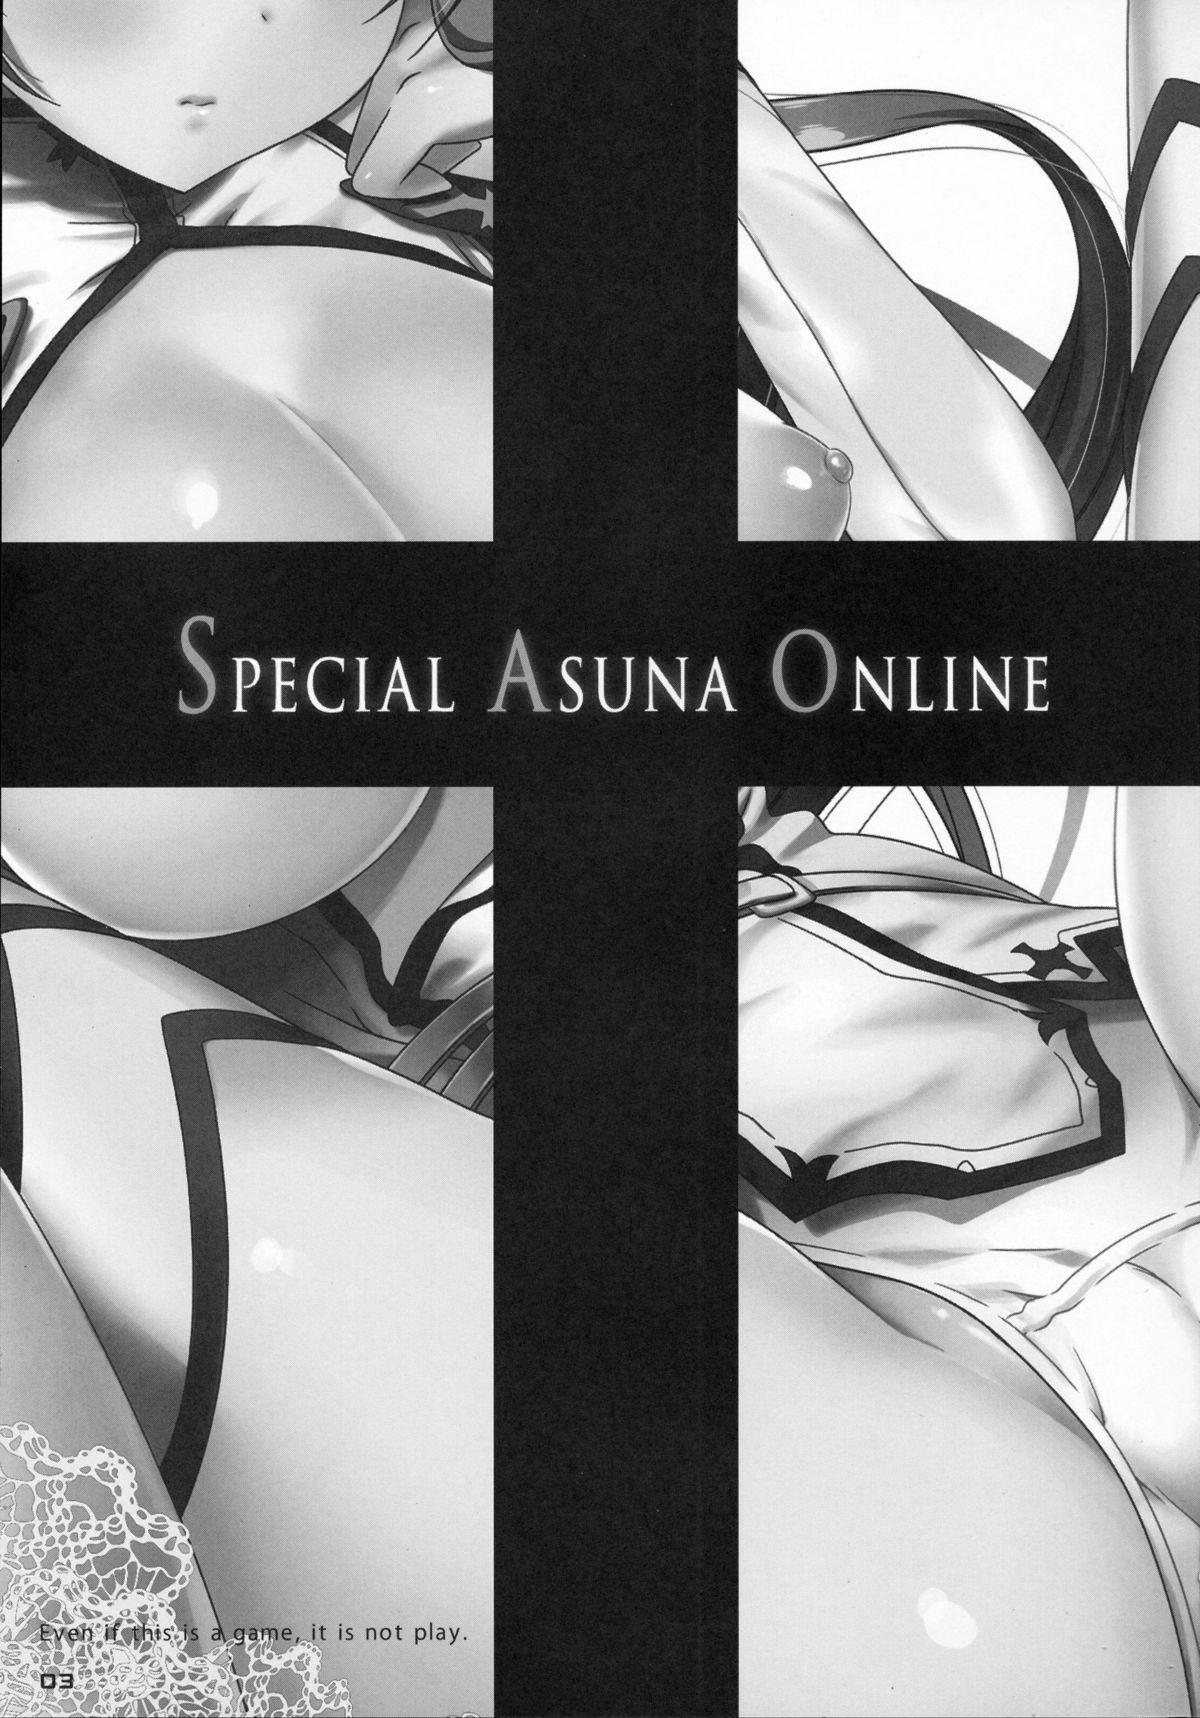 SPECIAL ASUNA ONLINE 2